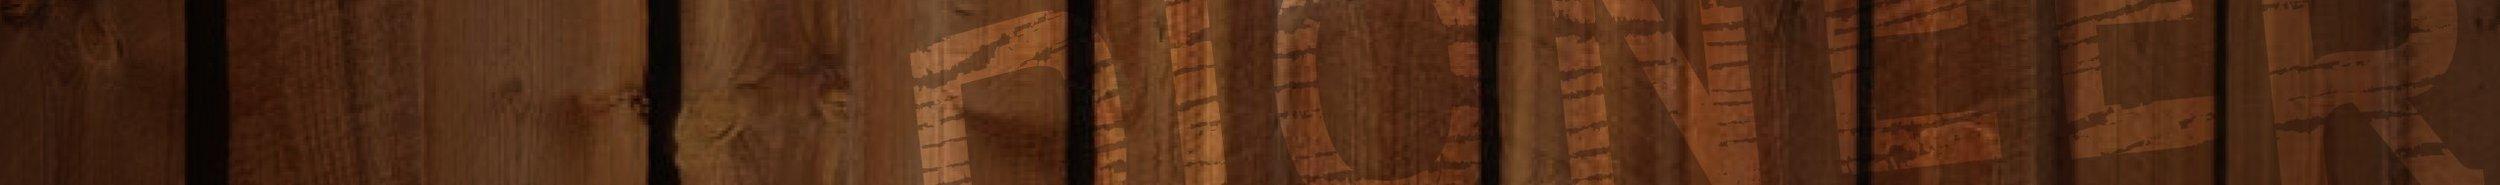 Pioneer Wood Patina                             PIONEER-WOOD.COM         250 Shepherd Trail Unit-A                        info@pioneer-wood.com         Bozeman, MT 59718                             406-624-0654